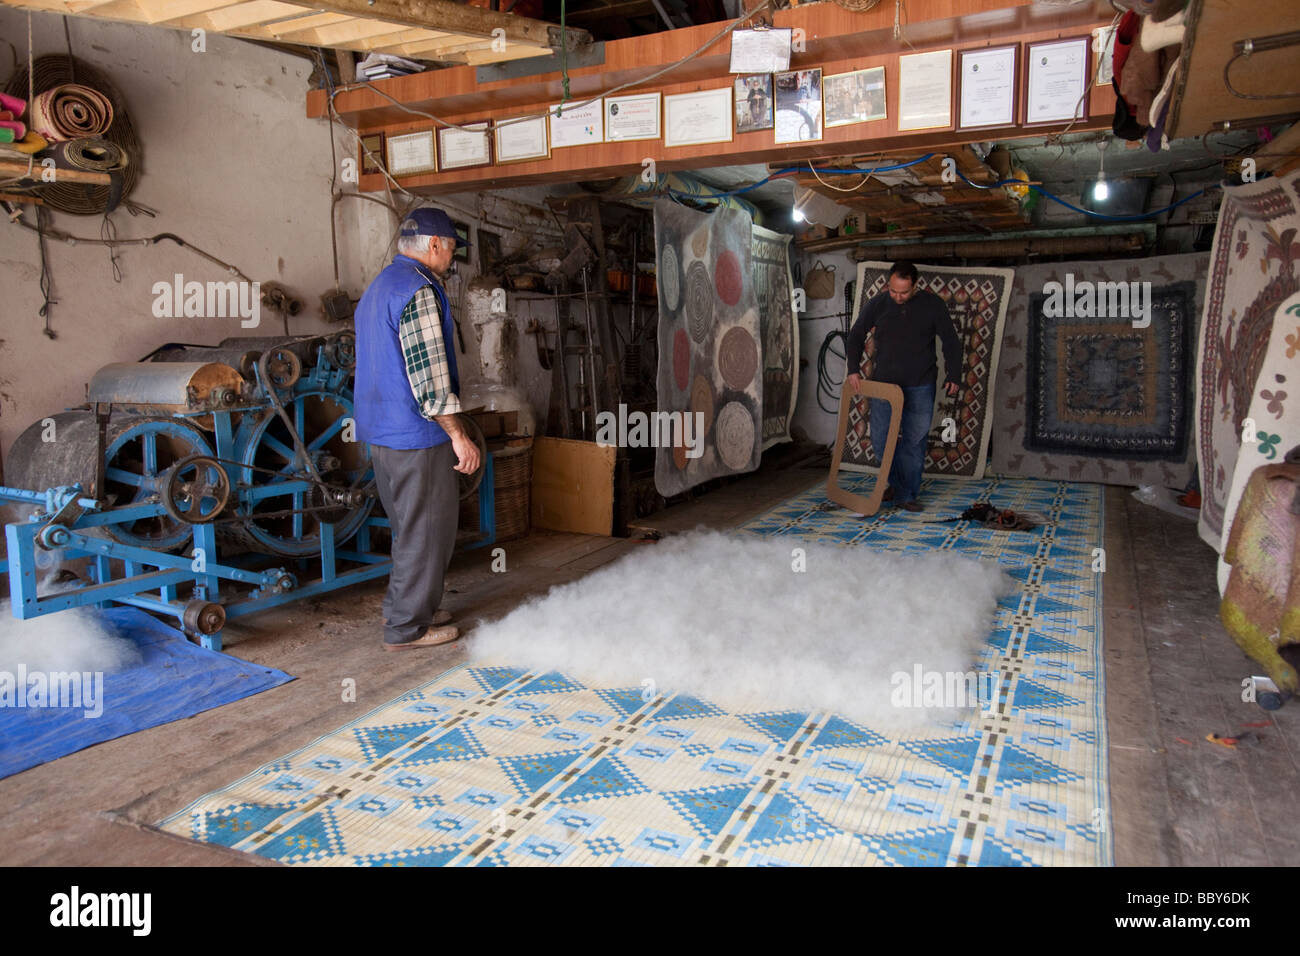 Small felt rug factory in western Turkey - Stock Image